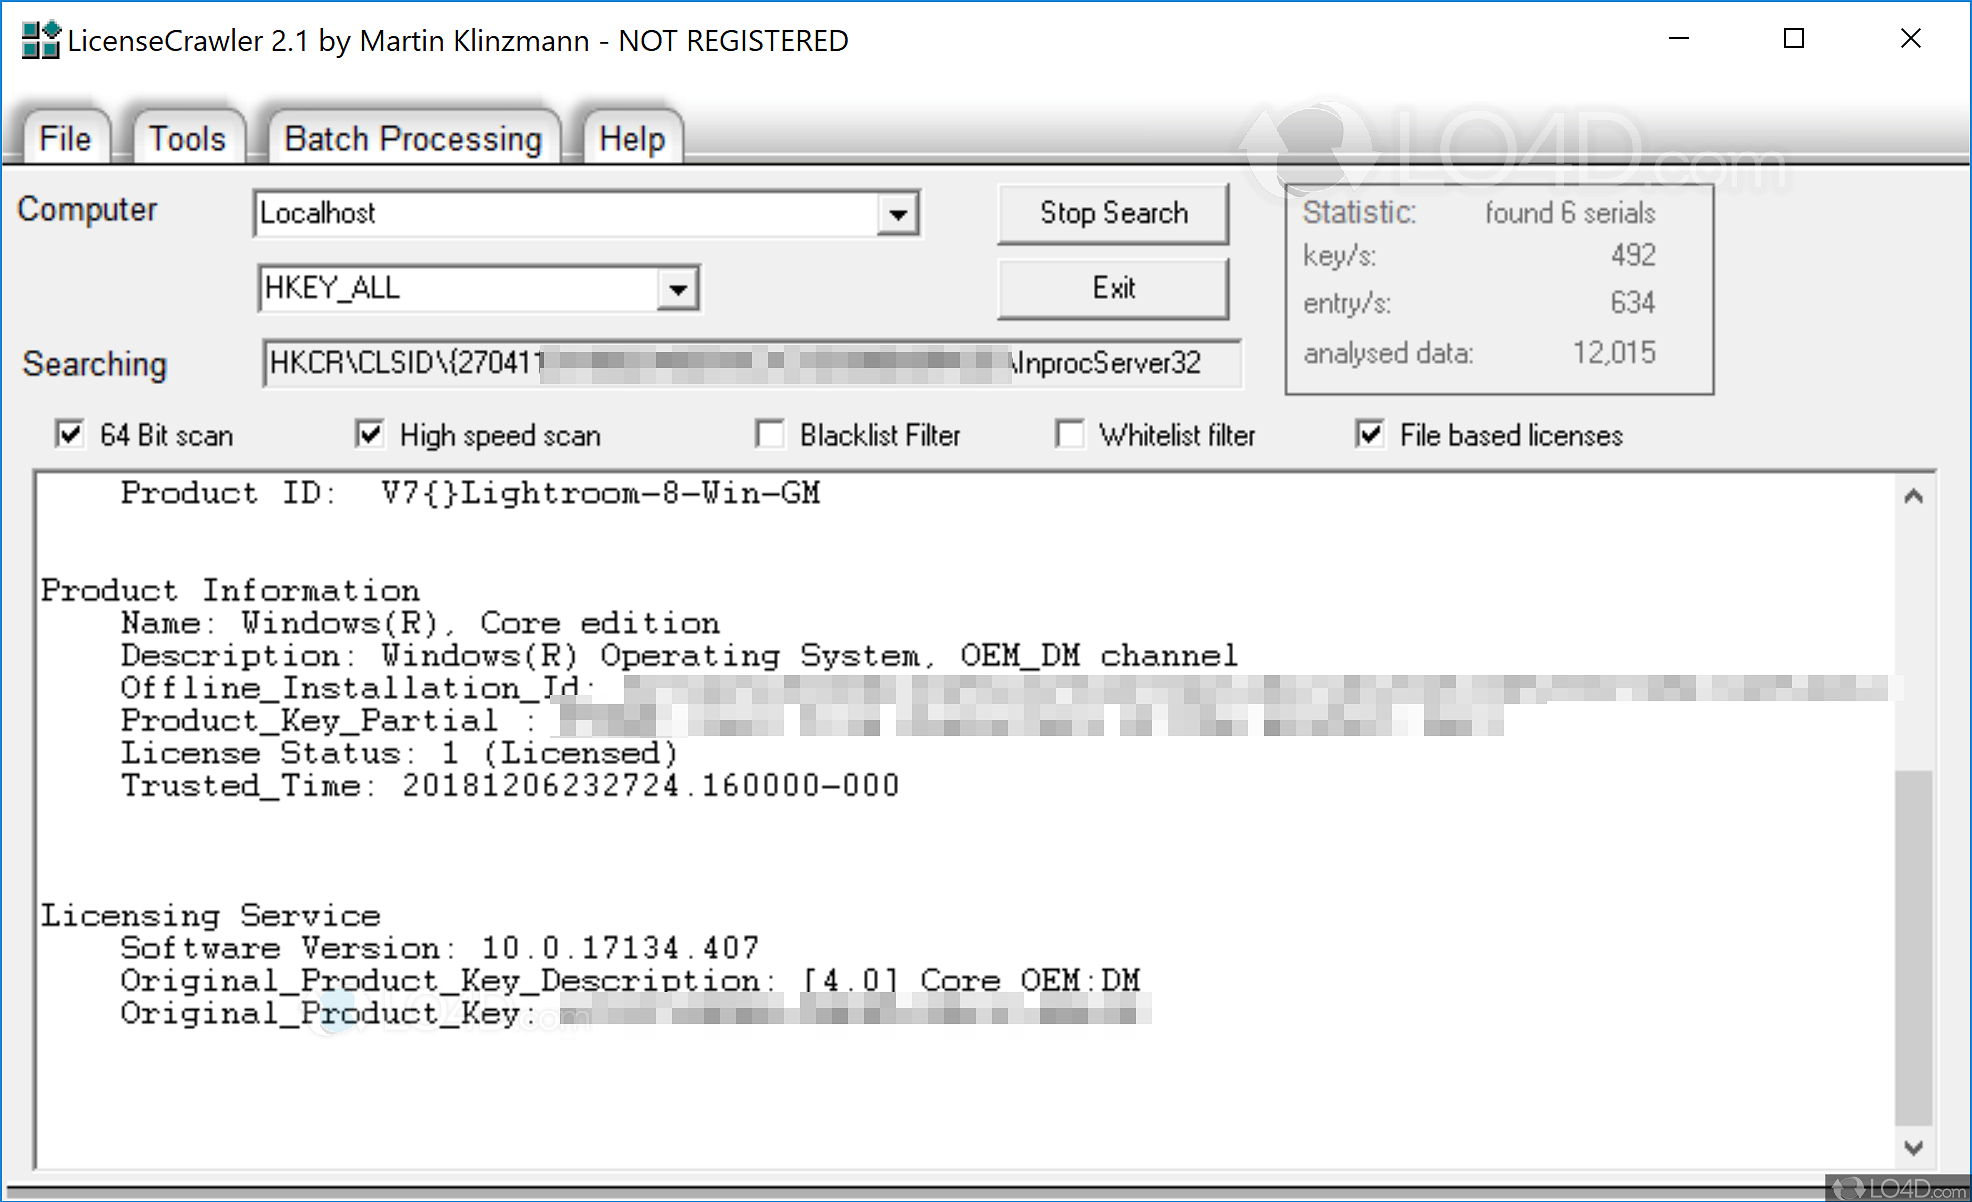 licensecrawler windows 7 product key